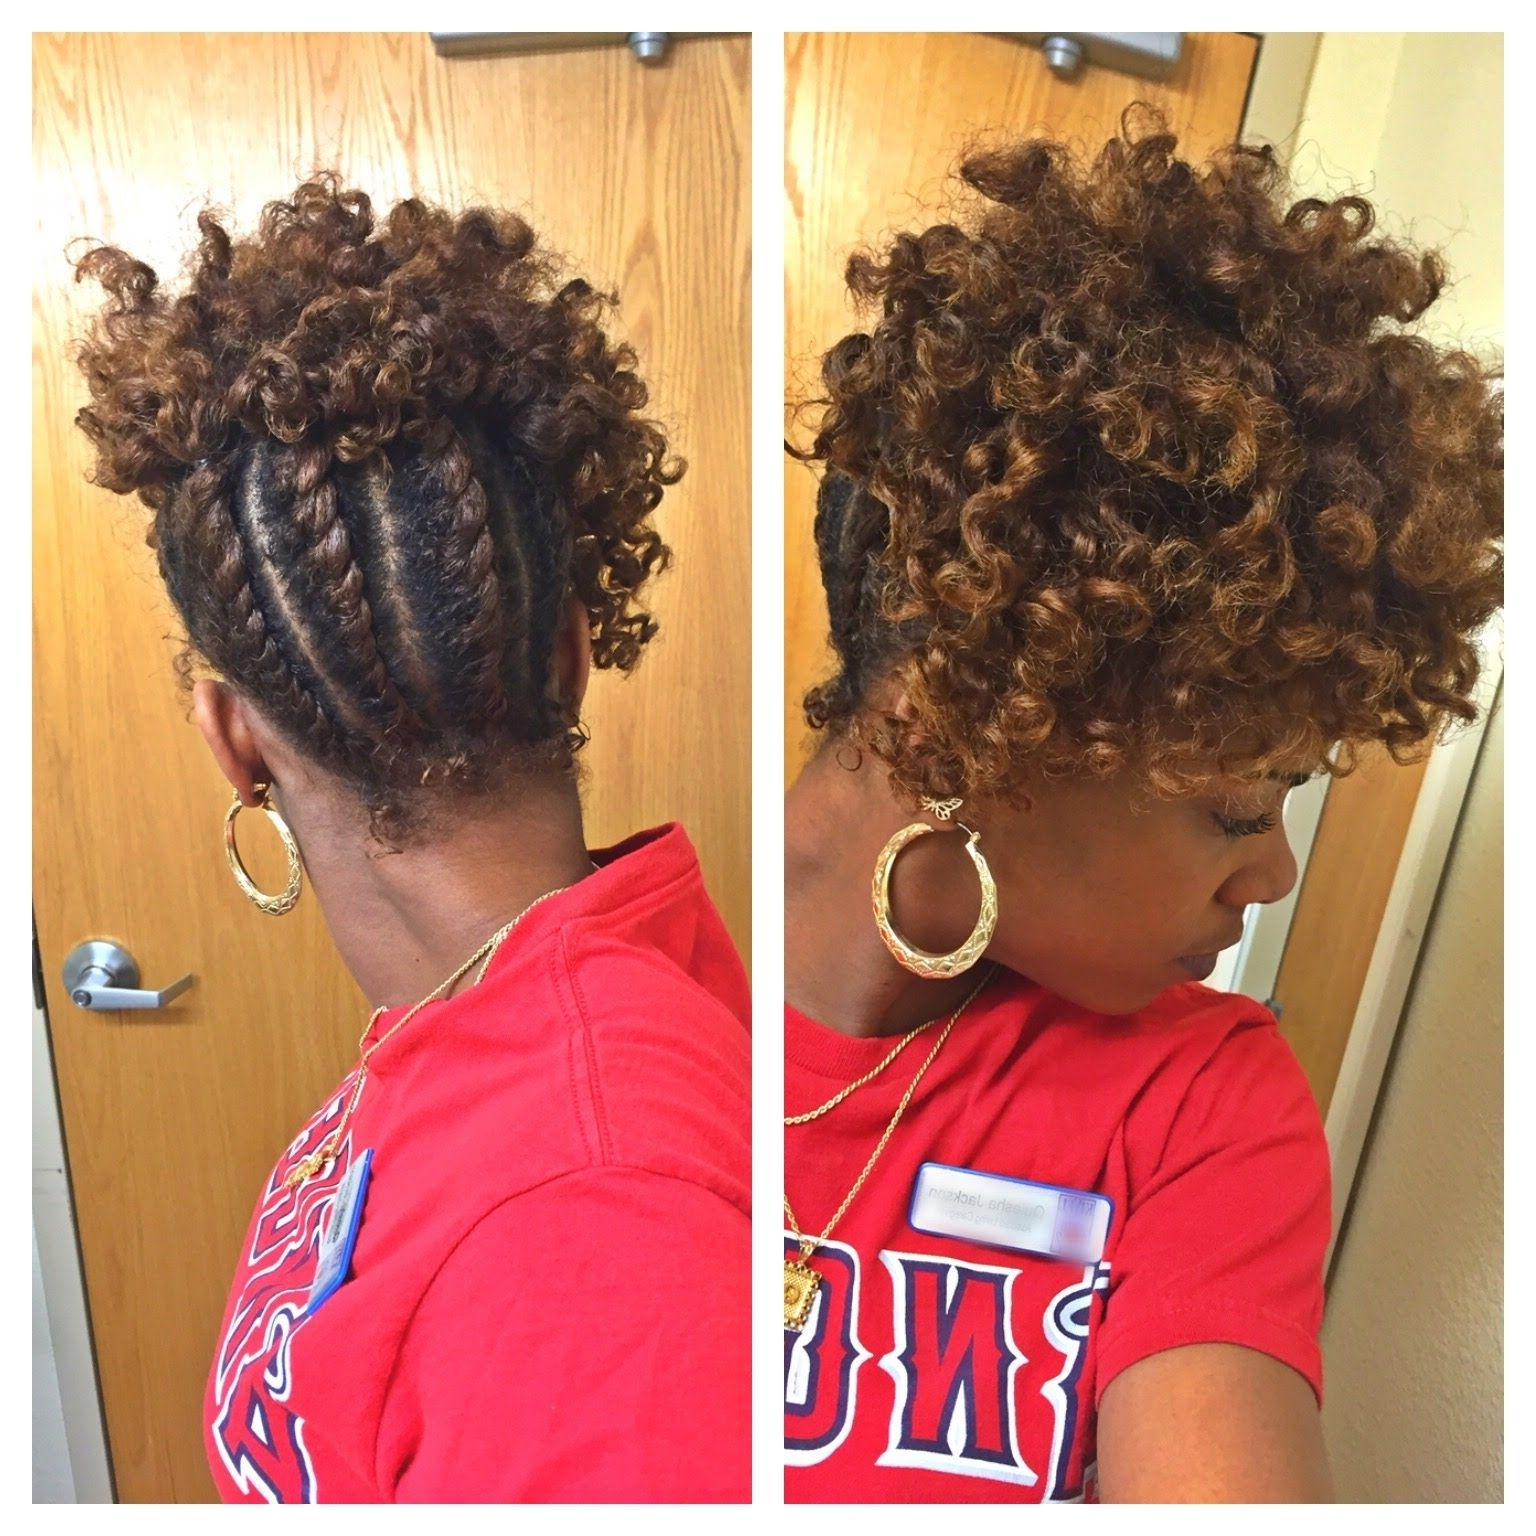 Flat Twist Updo Tutorial | Natural Hair | Hair: Natural Tutorials Throughout Updo Twist Hairstyles For Natural Hair (View 2 of 15)